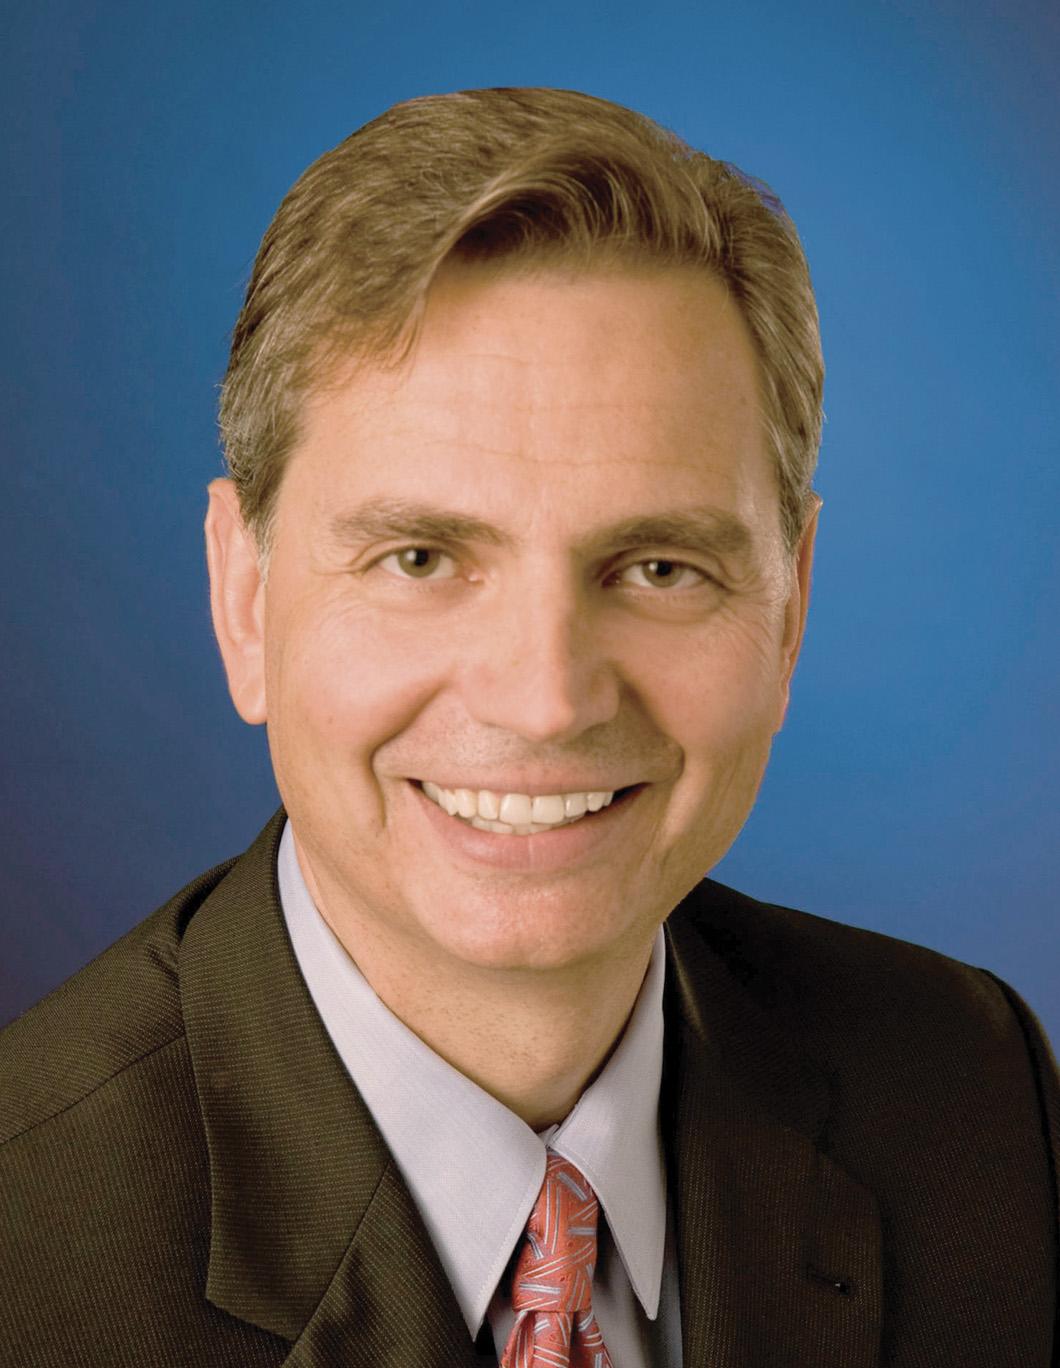 Greg Kiraly